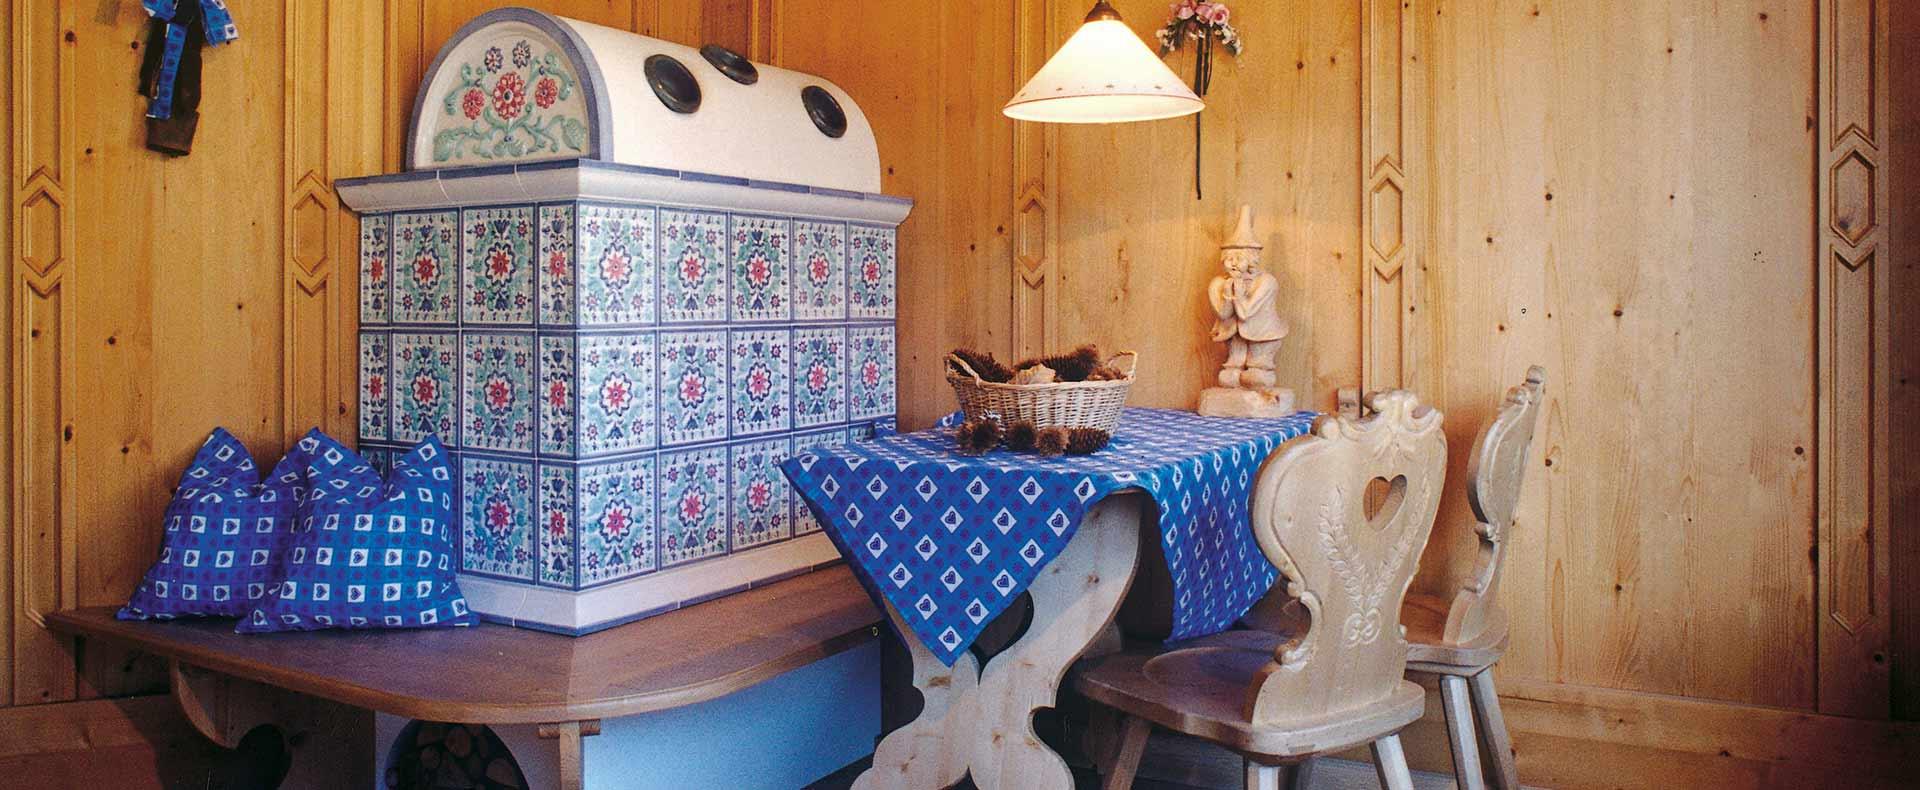 abbastanza Stube Tirolese: arredamenti di interni in legno tradizionali  WZ23